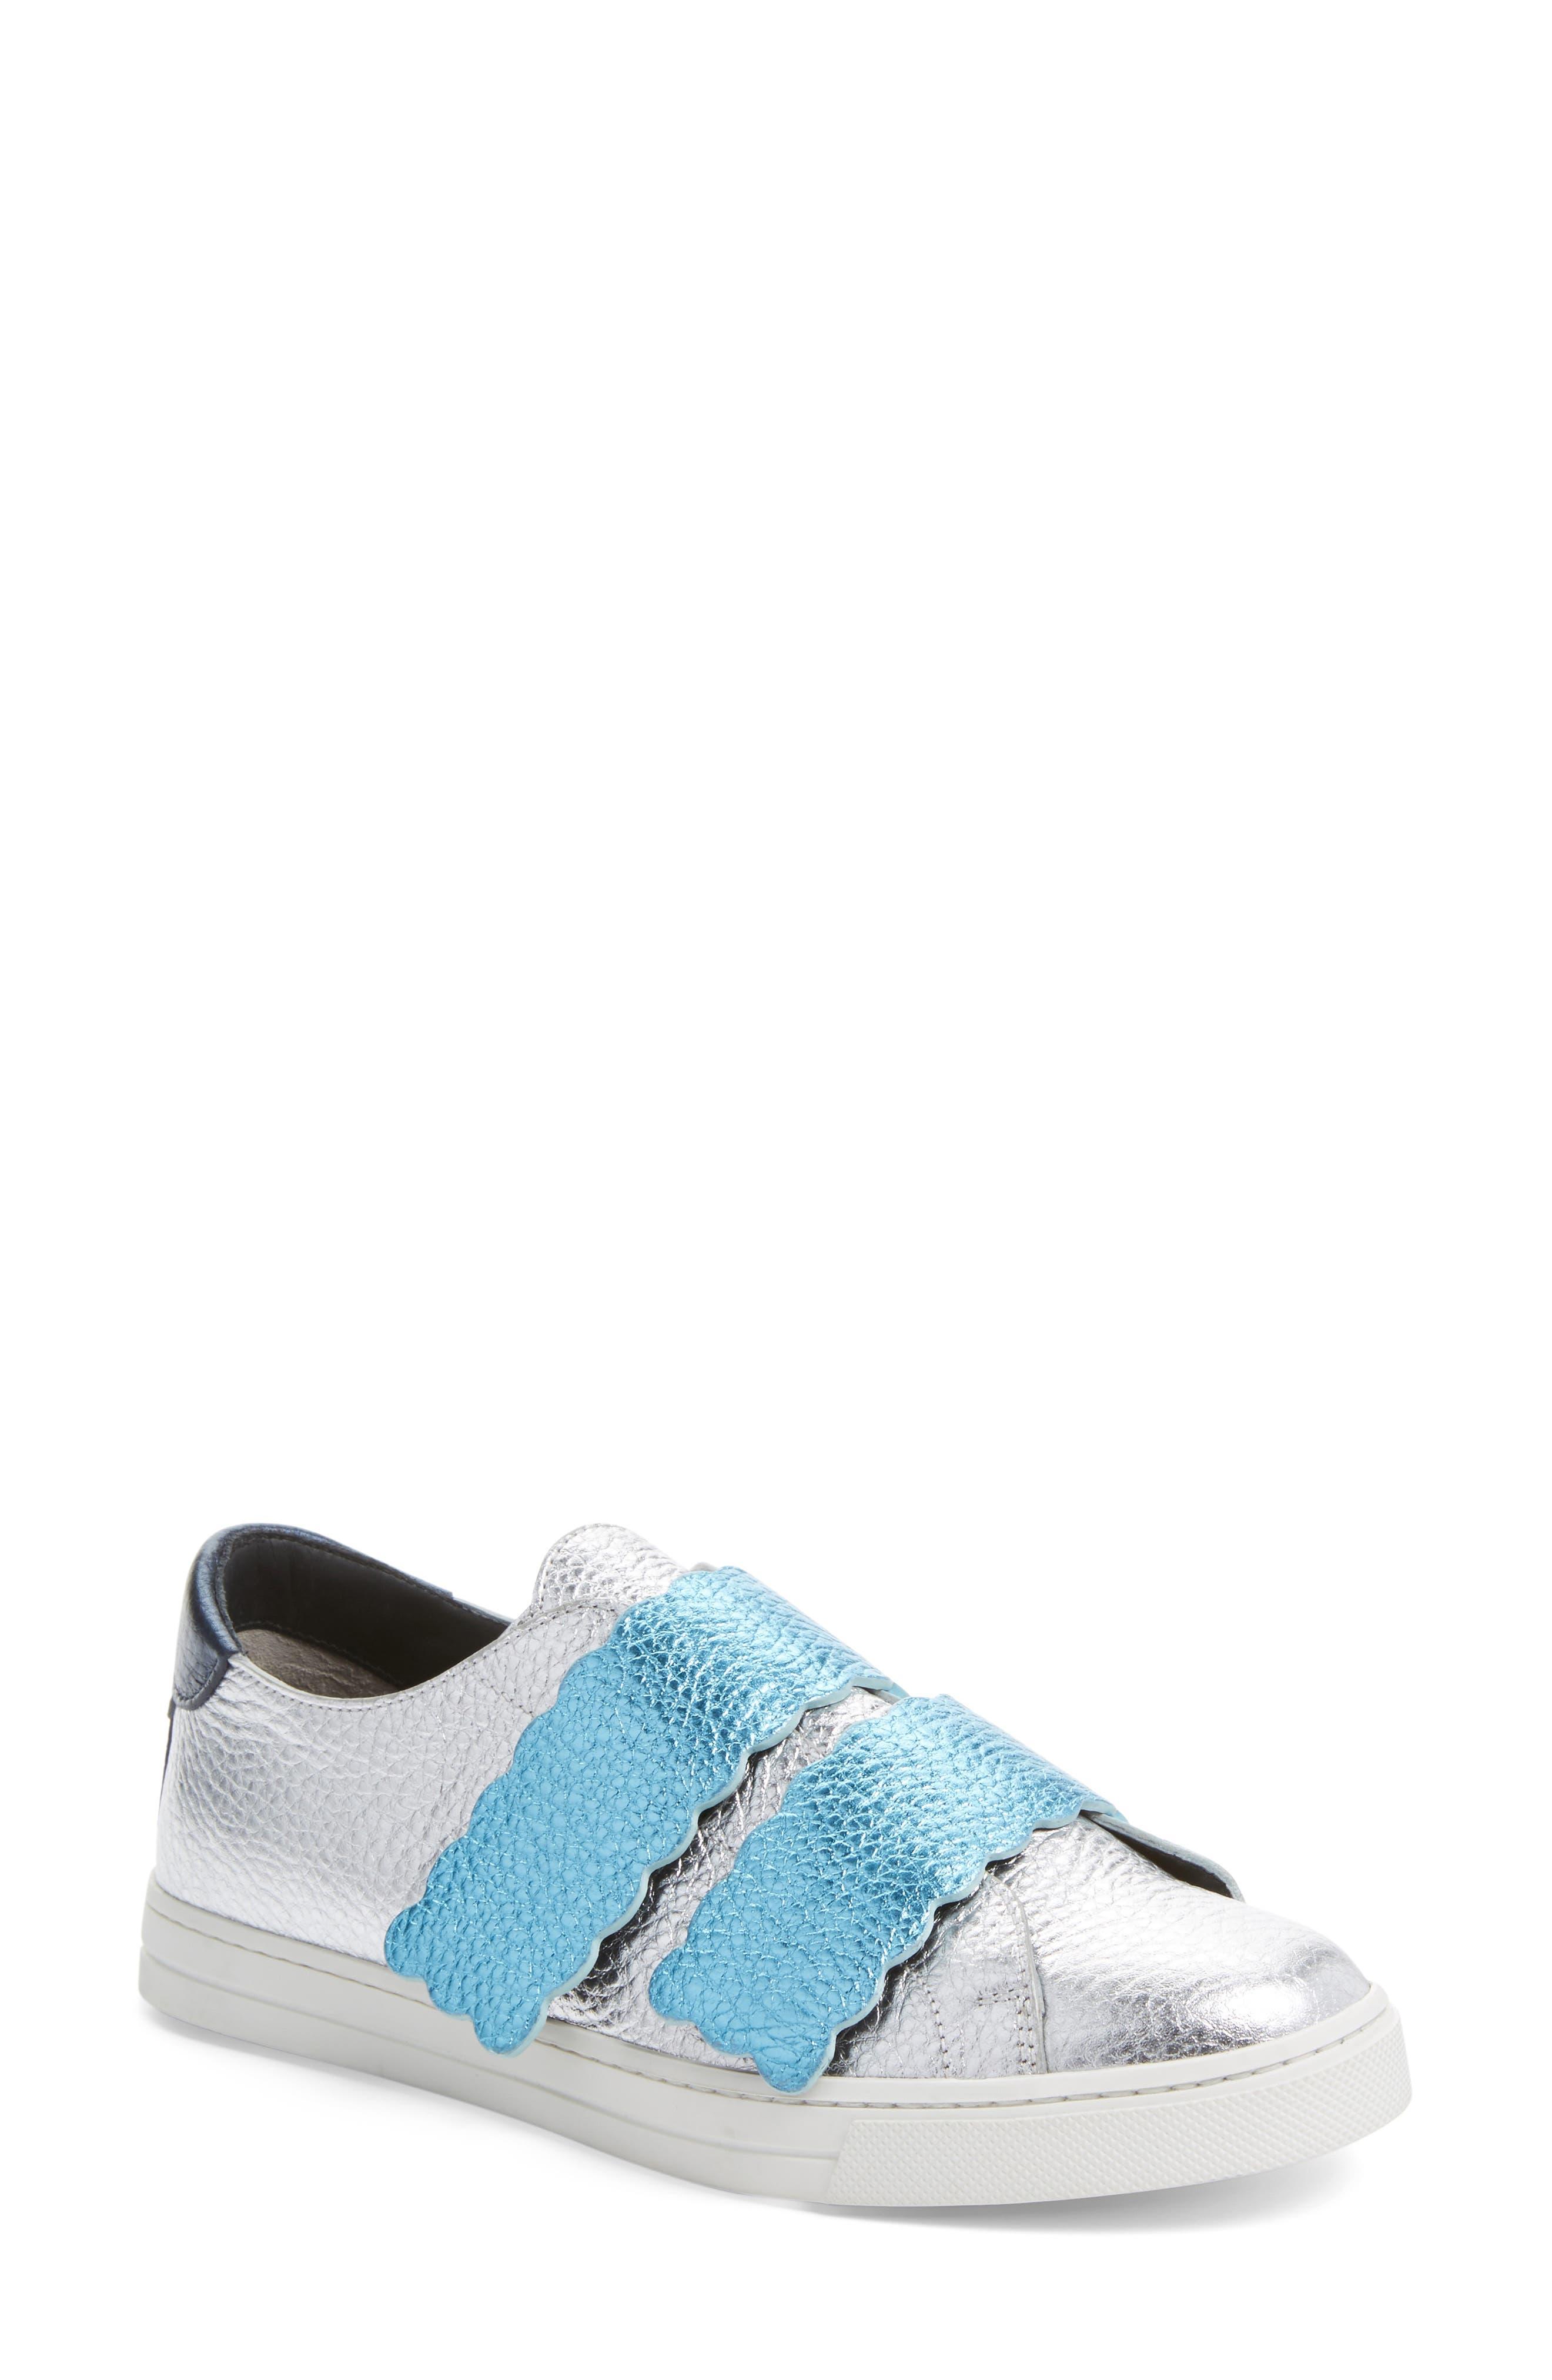 Fendi Scallop Sneaker (Women)